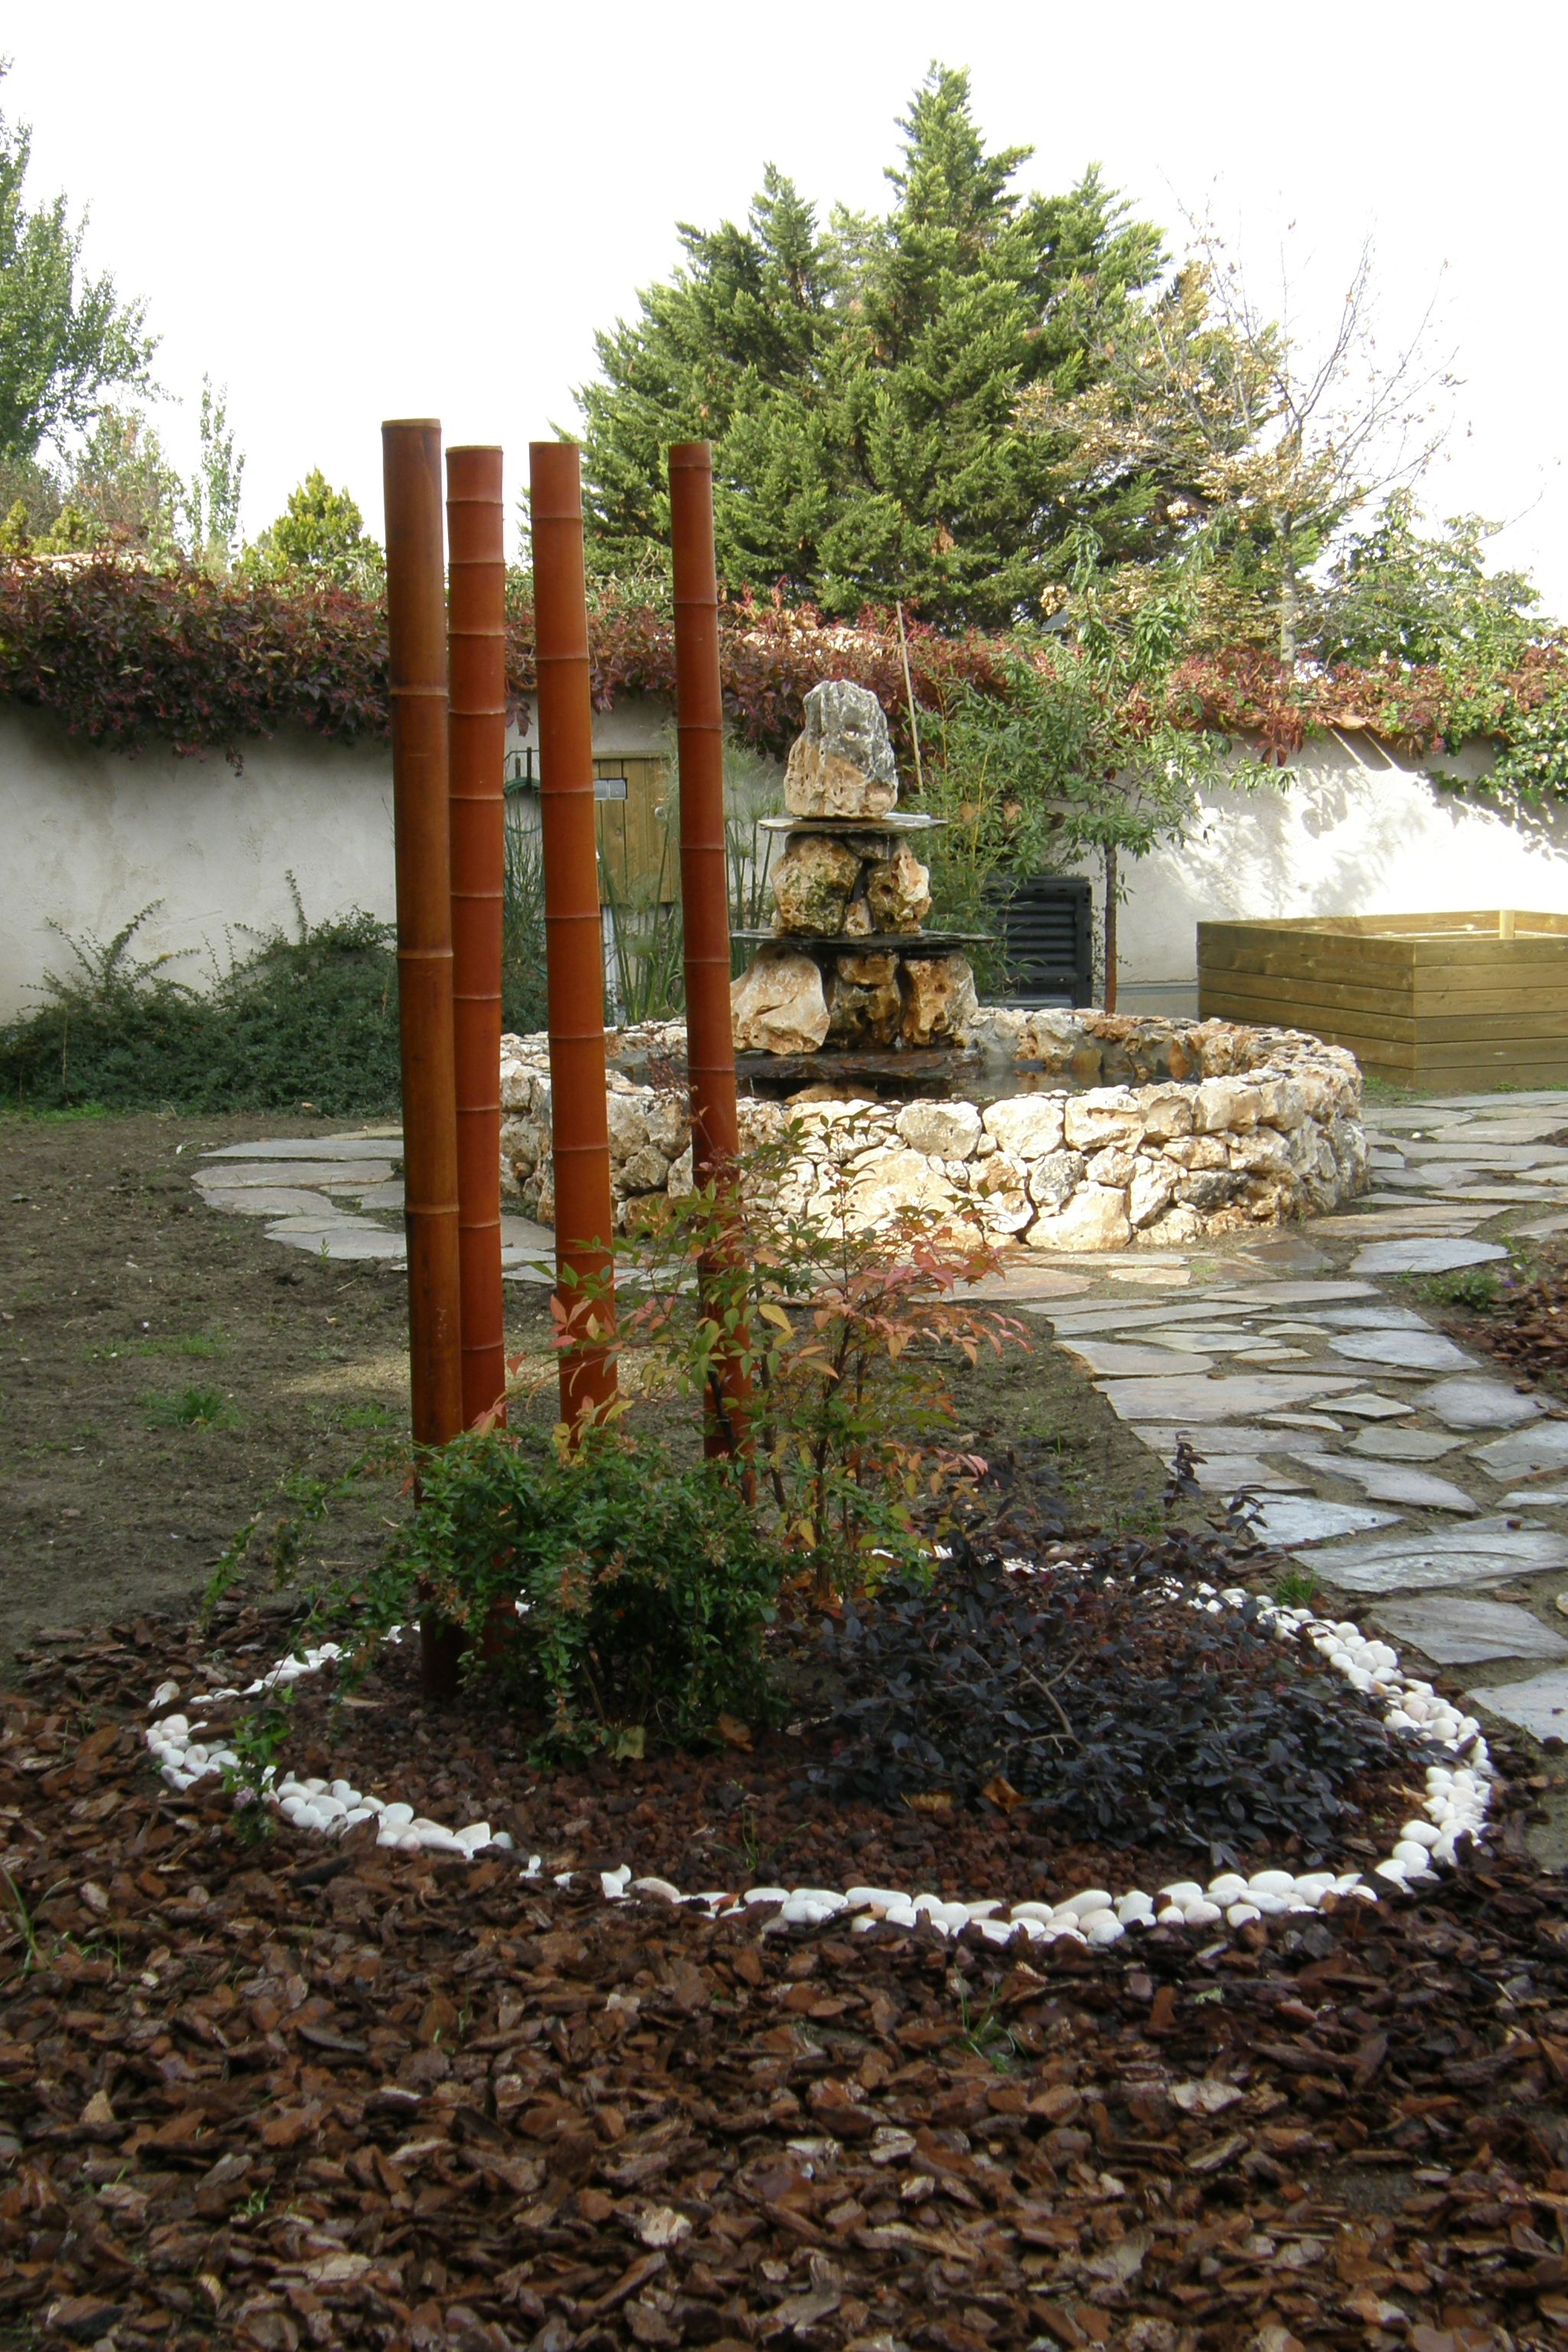 Isleta de piedras y bamb Segovia